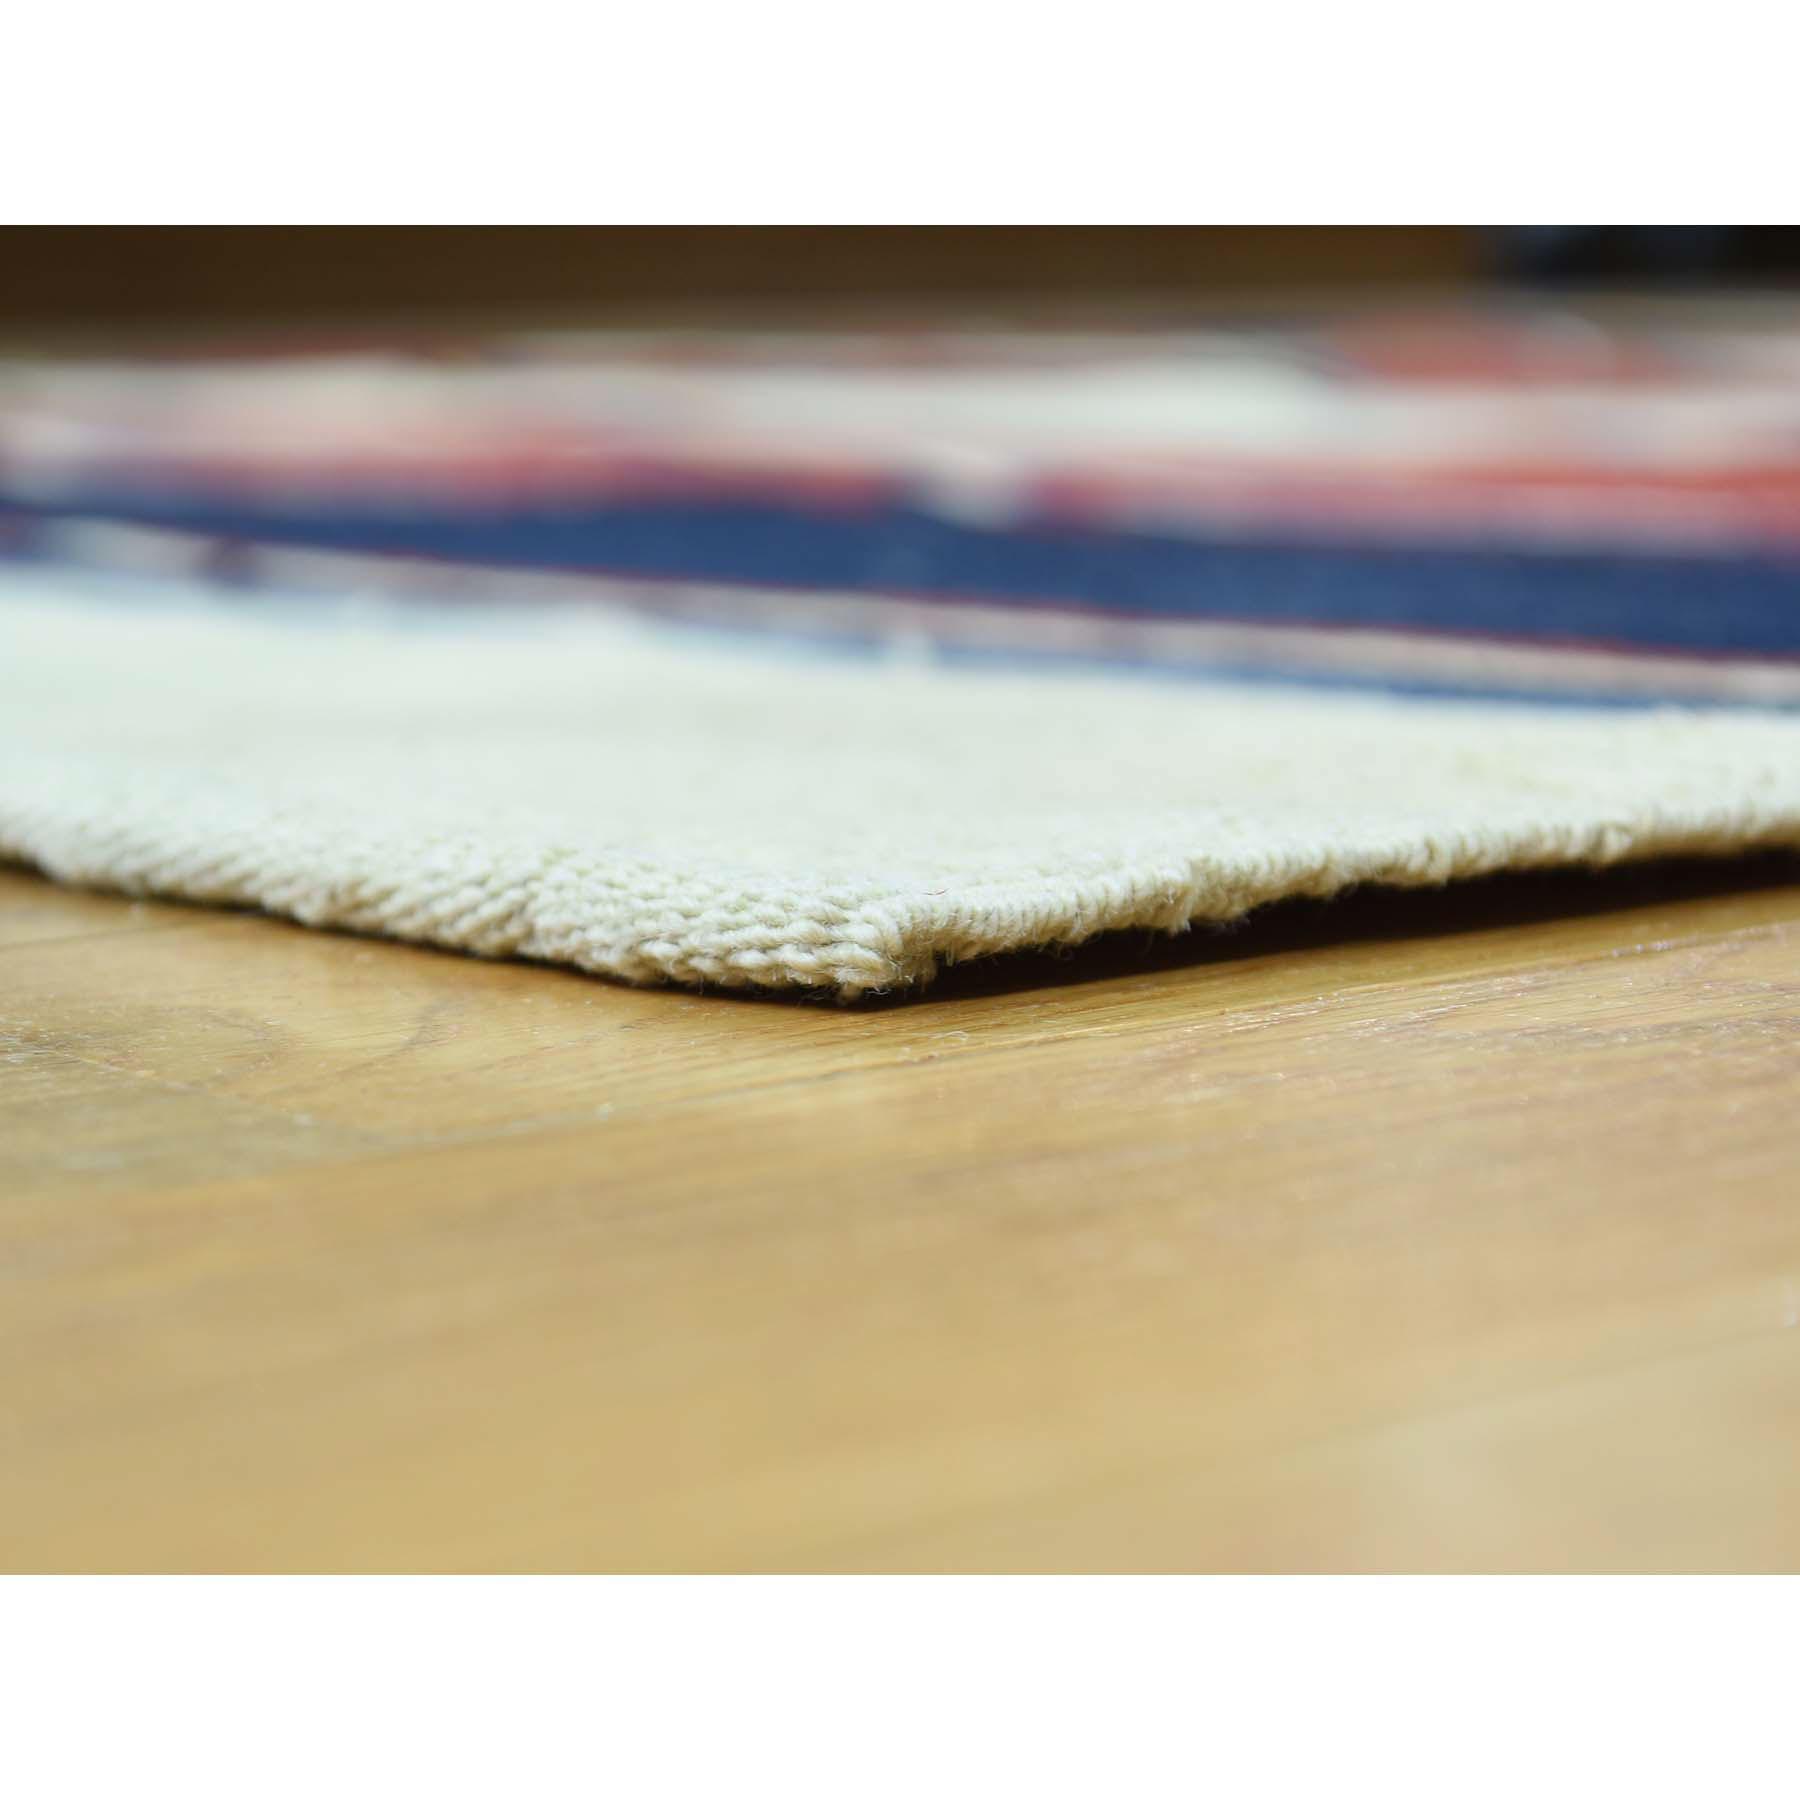 6-5 x9- Hand Woven Flat Weave Striped Qashqai Kilim Oriental Rug